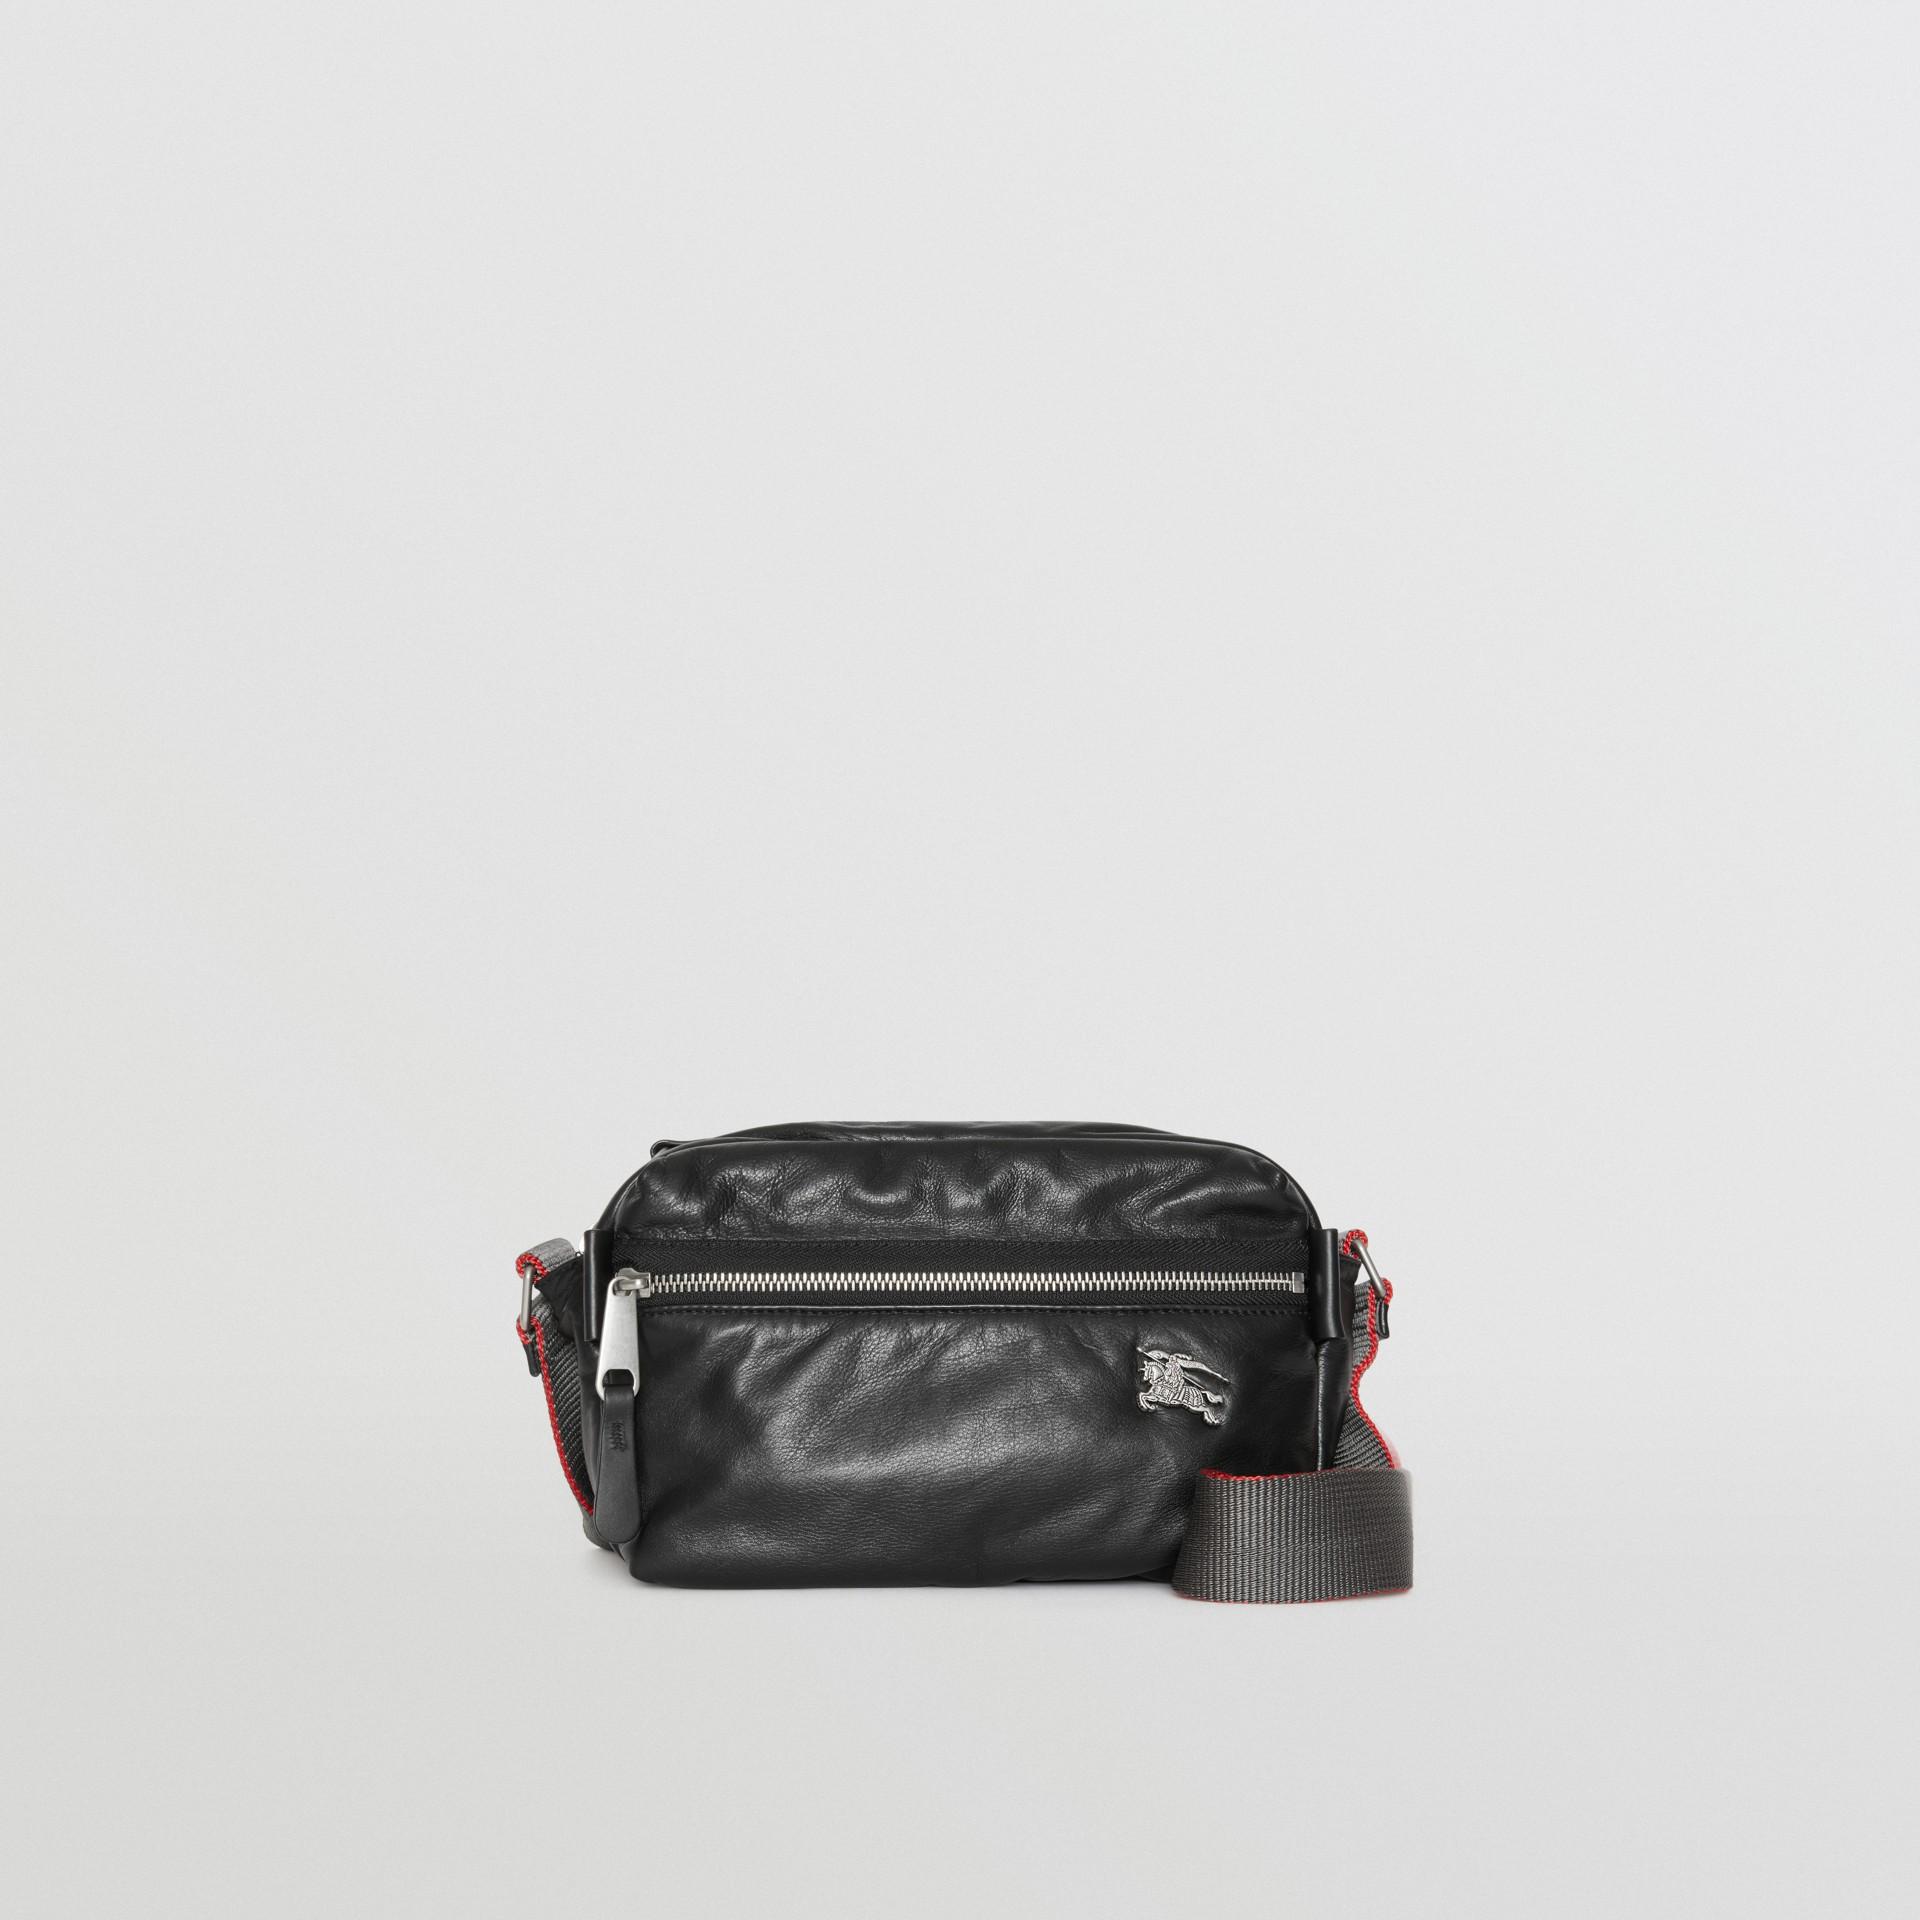 EKD Nappa Leather Crossbody Bag in Black - Men | Burberry United Kingdom - gallery image 0